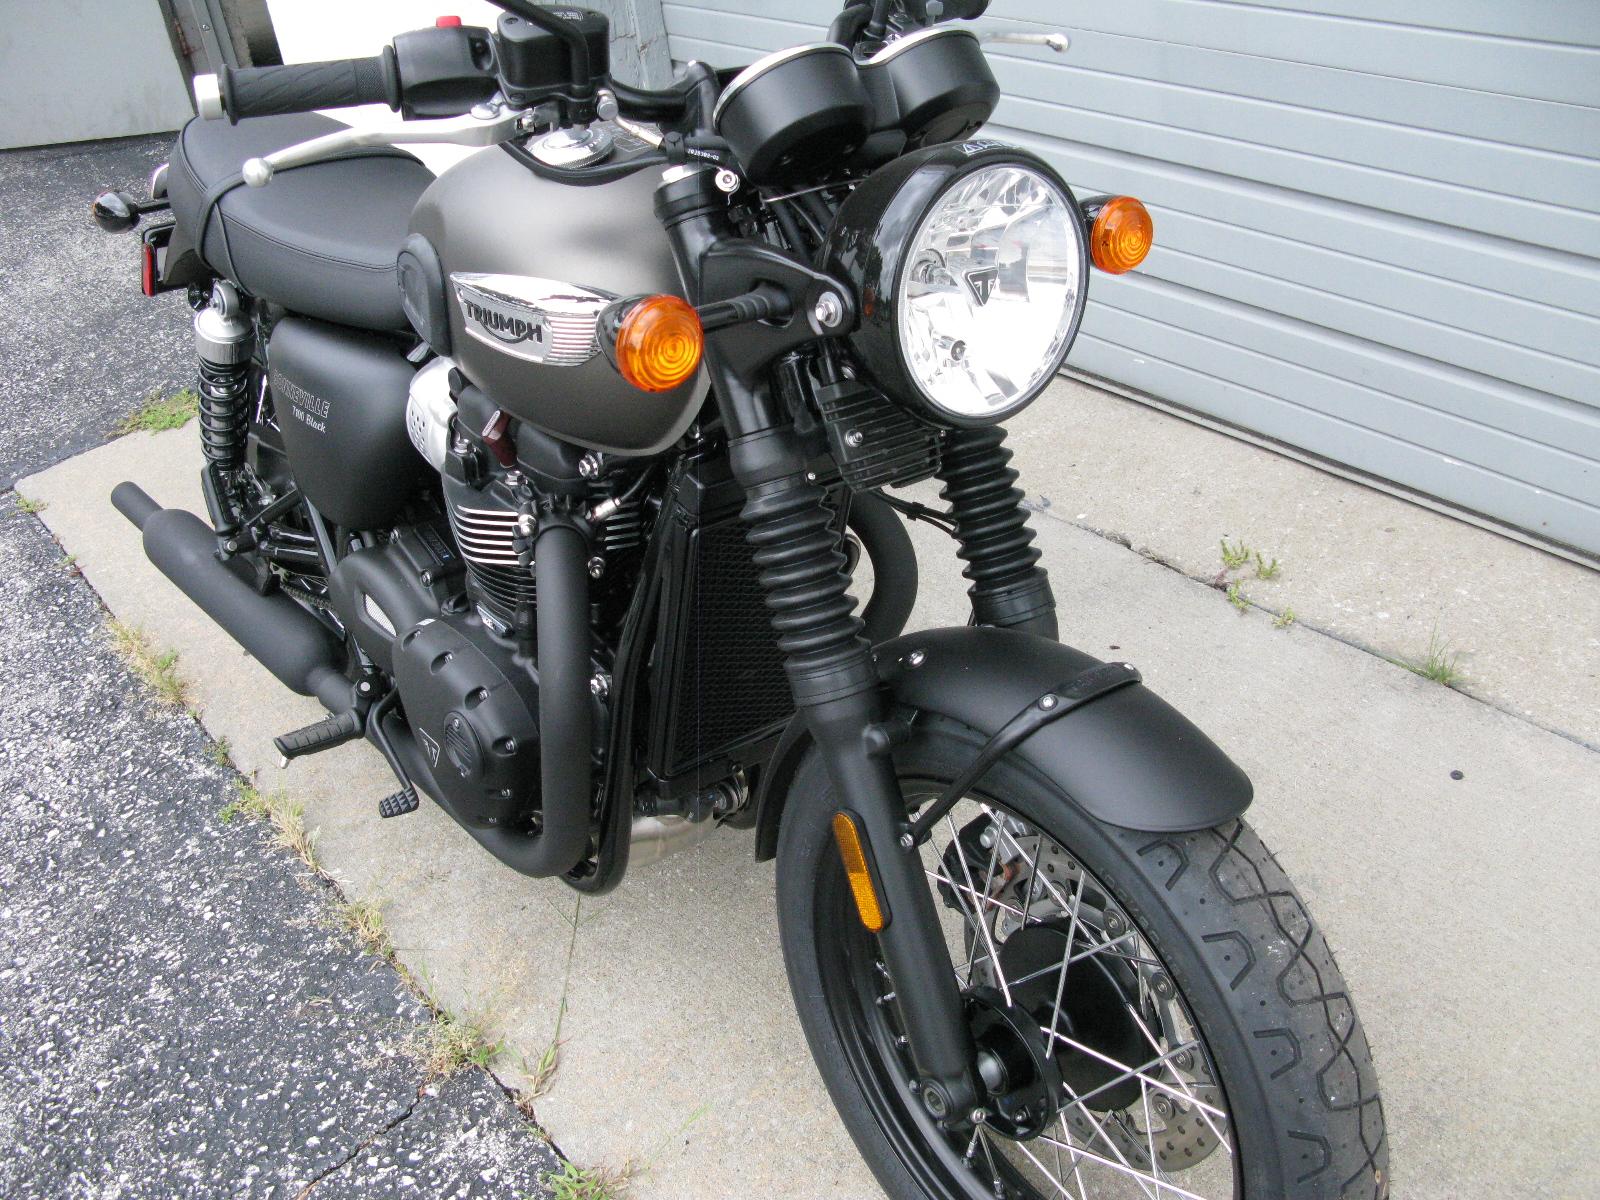 2020 Triumph Bonneville T100 Black For Sale In Kansas City Mo Engle Motors Kansas City Mo 816 241 7554